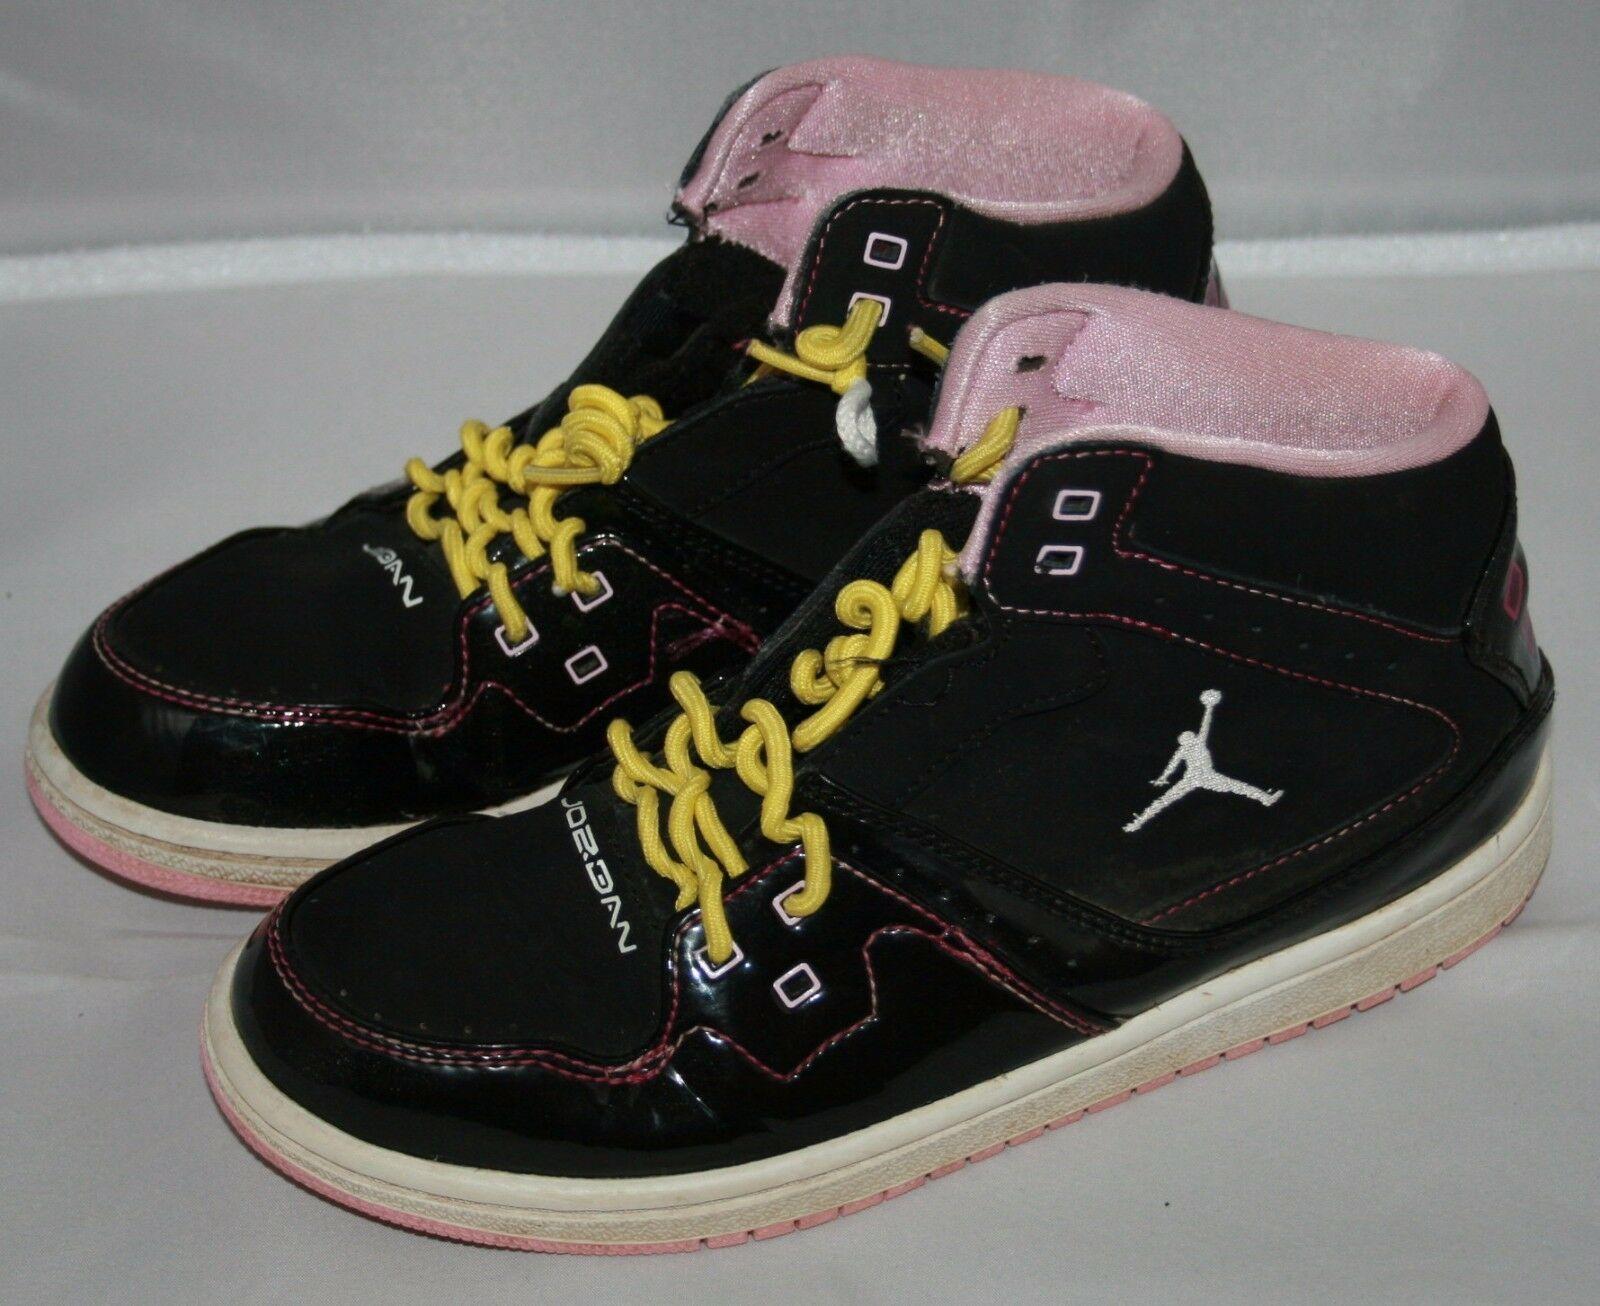 Nike Flight Jordan Sneakers Sz 3 Jahre Jugend Kinder Gelb Lockig Schnürsenkel